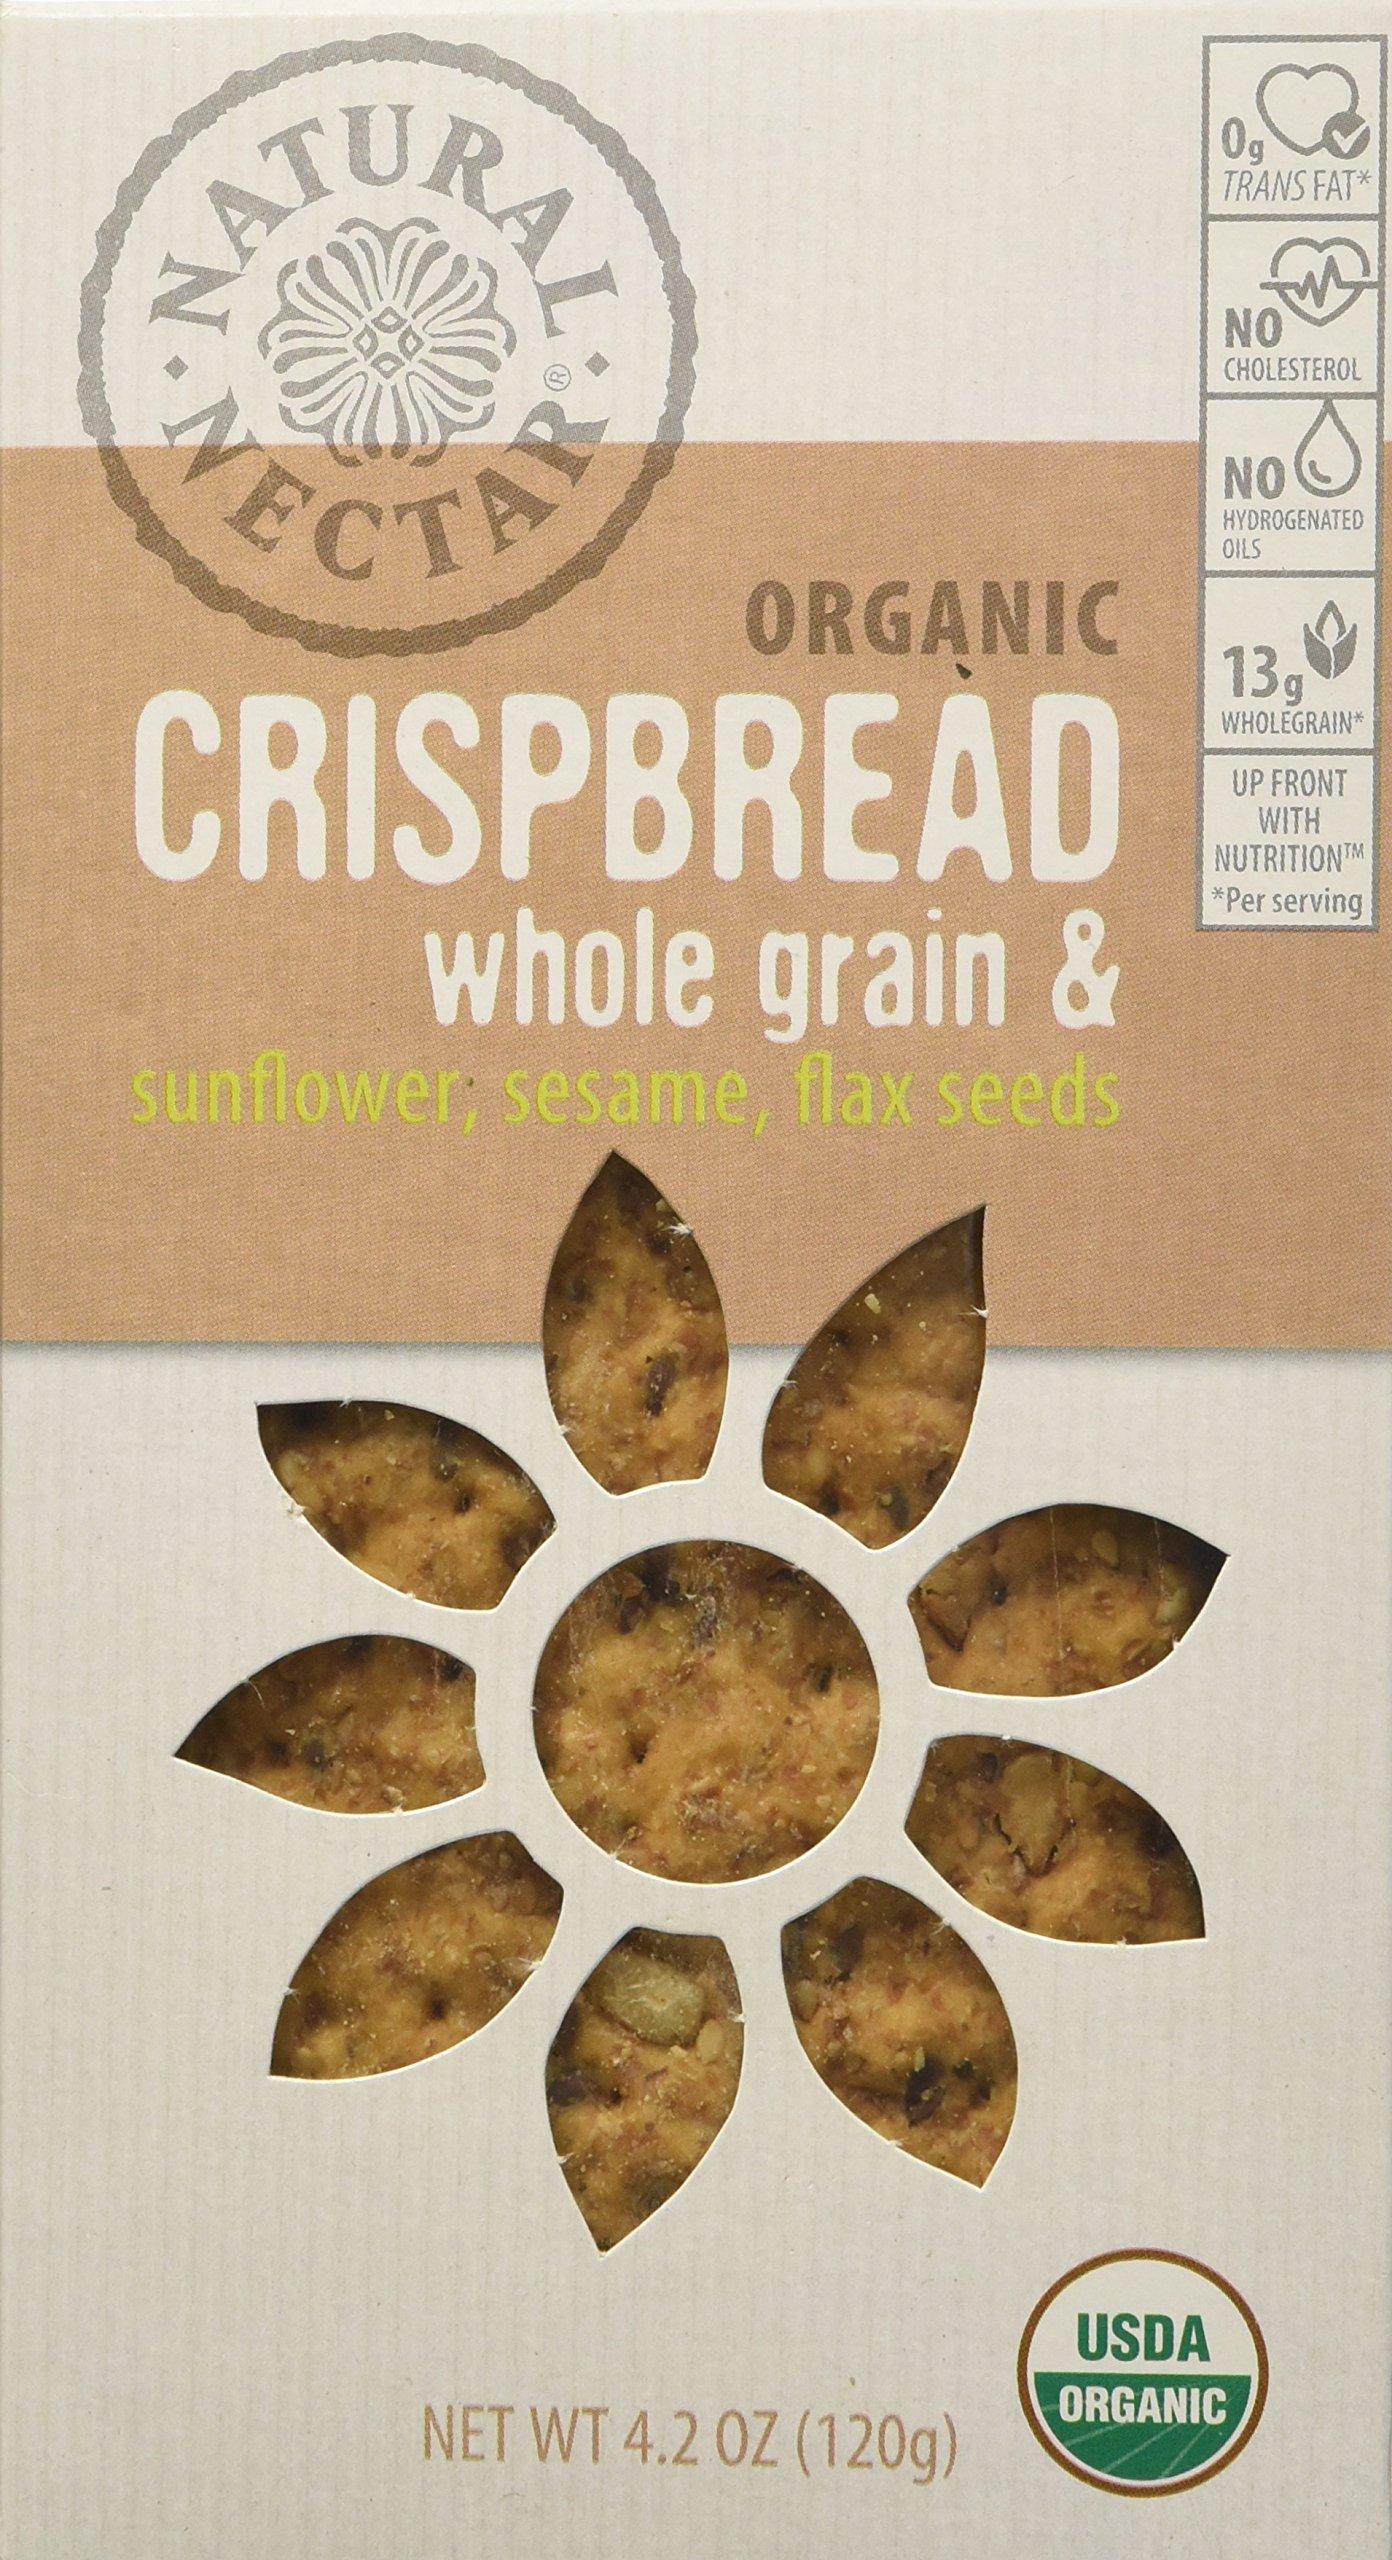 Natural Nectar Organic Crispbread, Whole Grain/Sunflower/Sesame/Flax Seed, 4.2 Ounce